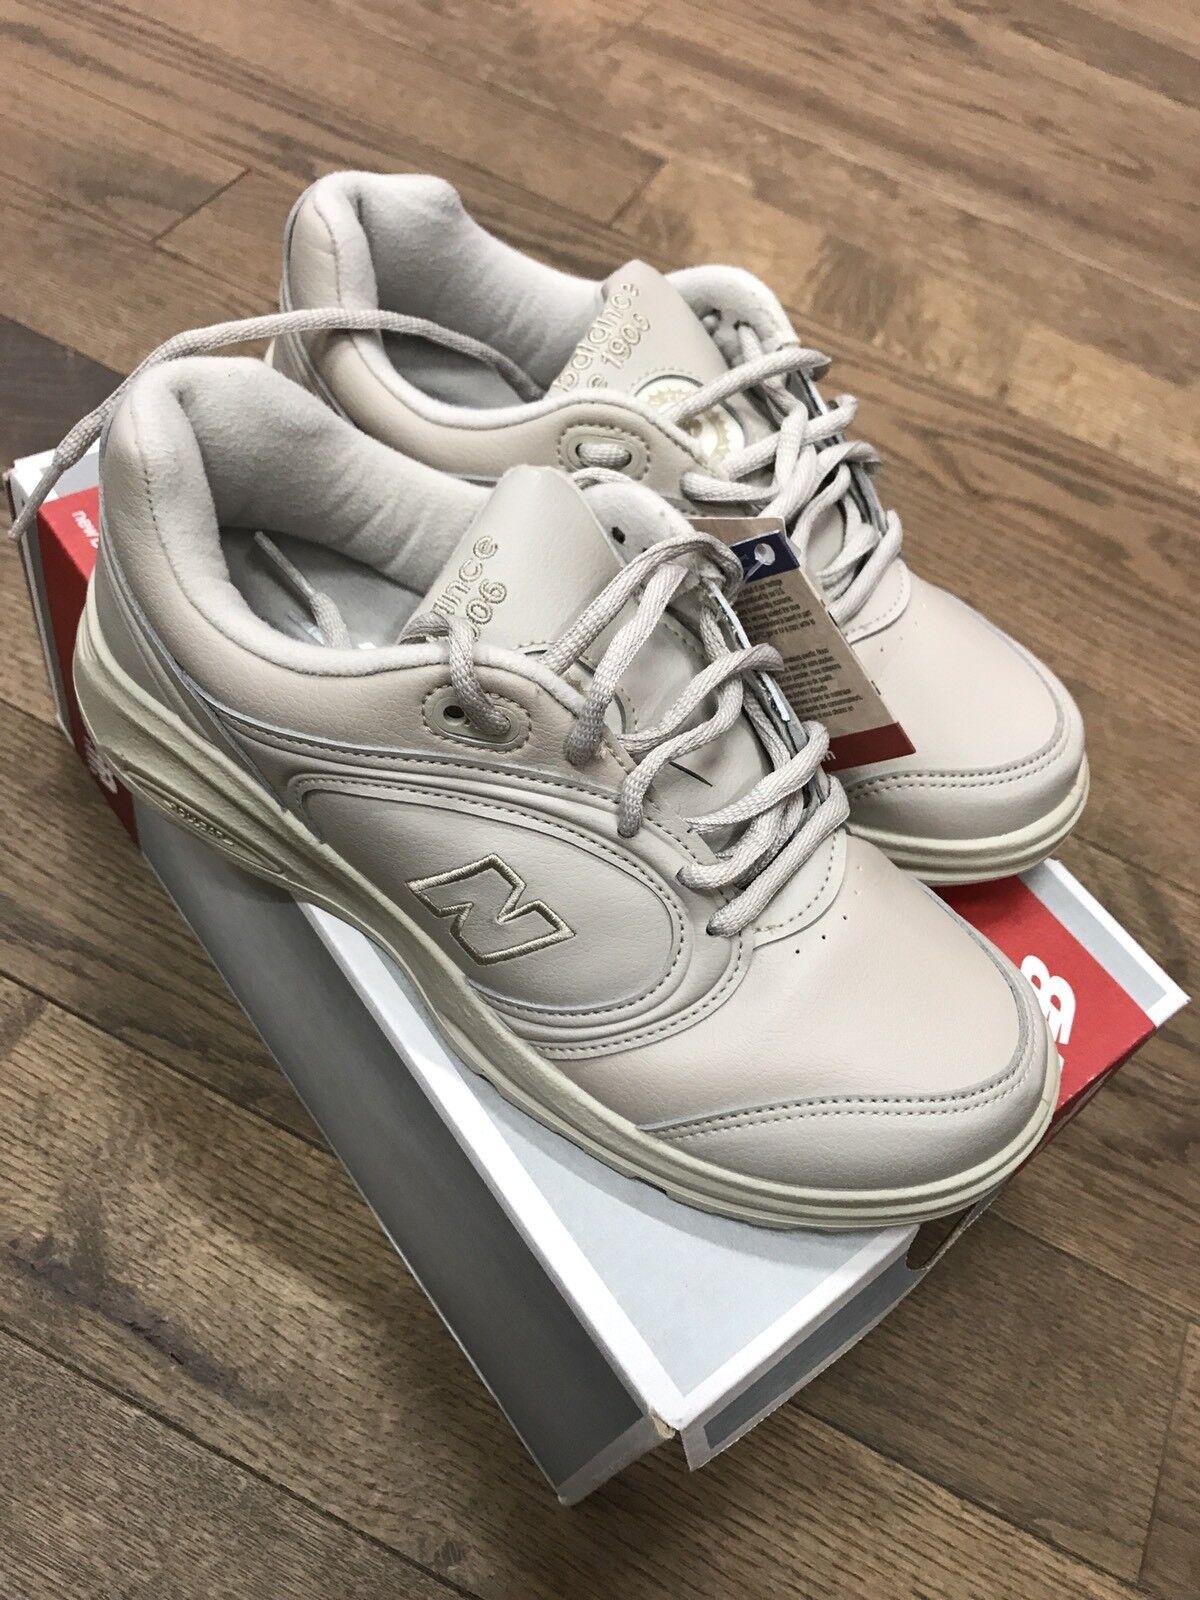 New balance WW812BE Shoes Roll Bar Size 6 140+ Women's